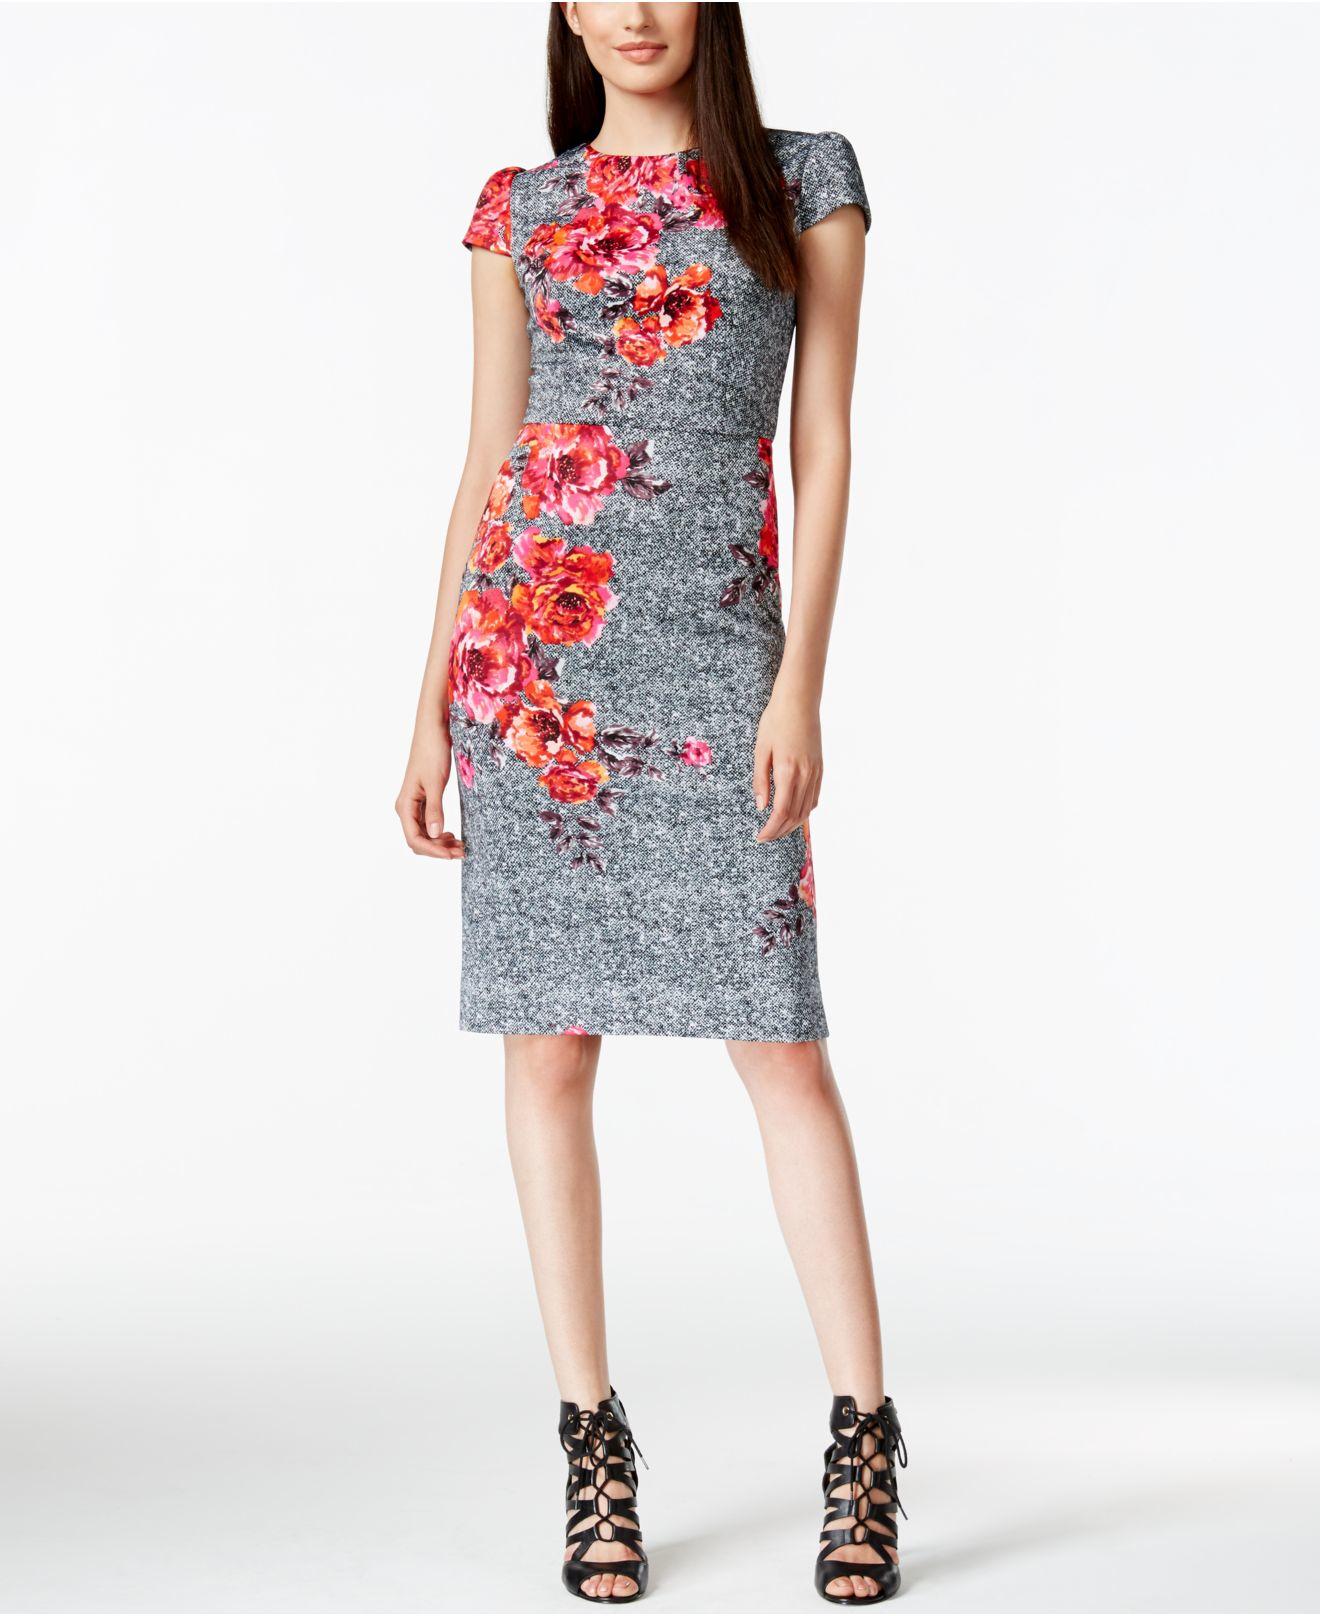 5c3475c849e Betsey Johnson Floral-print Sheath Dress - Lyst